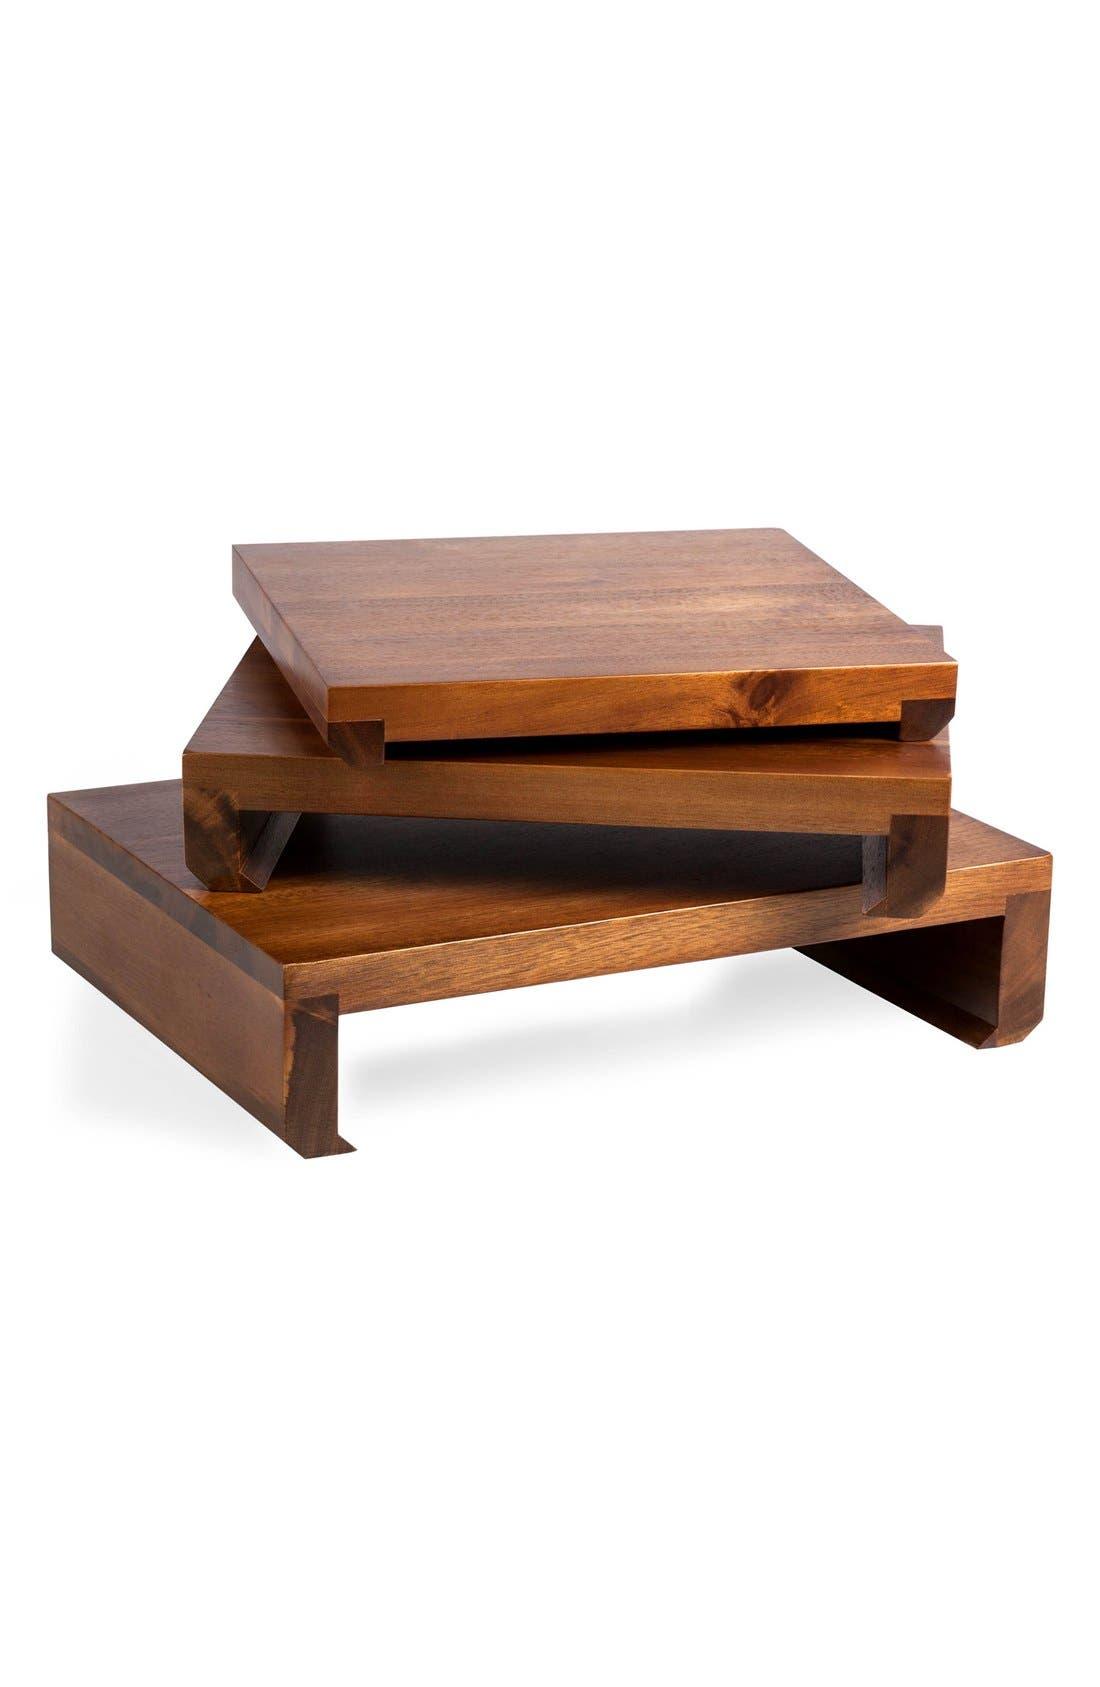 'Etage' Wood Serving Pedestals,                         Main,                         color, BROWN